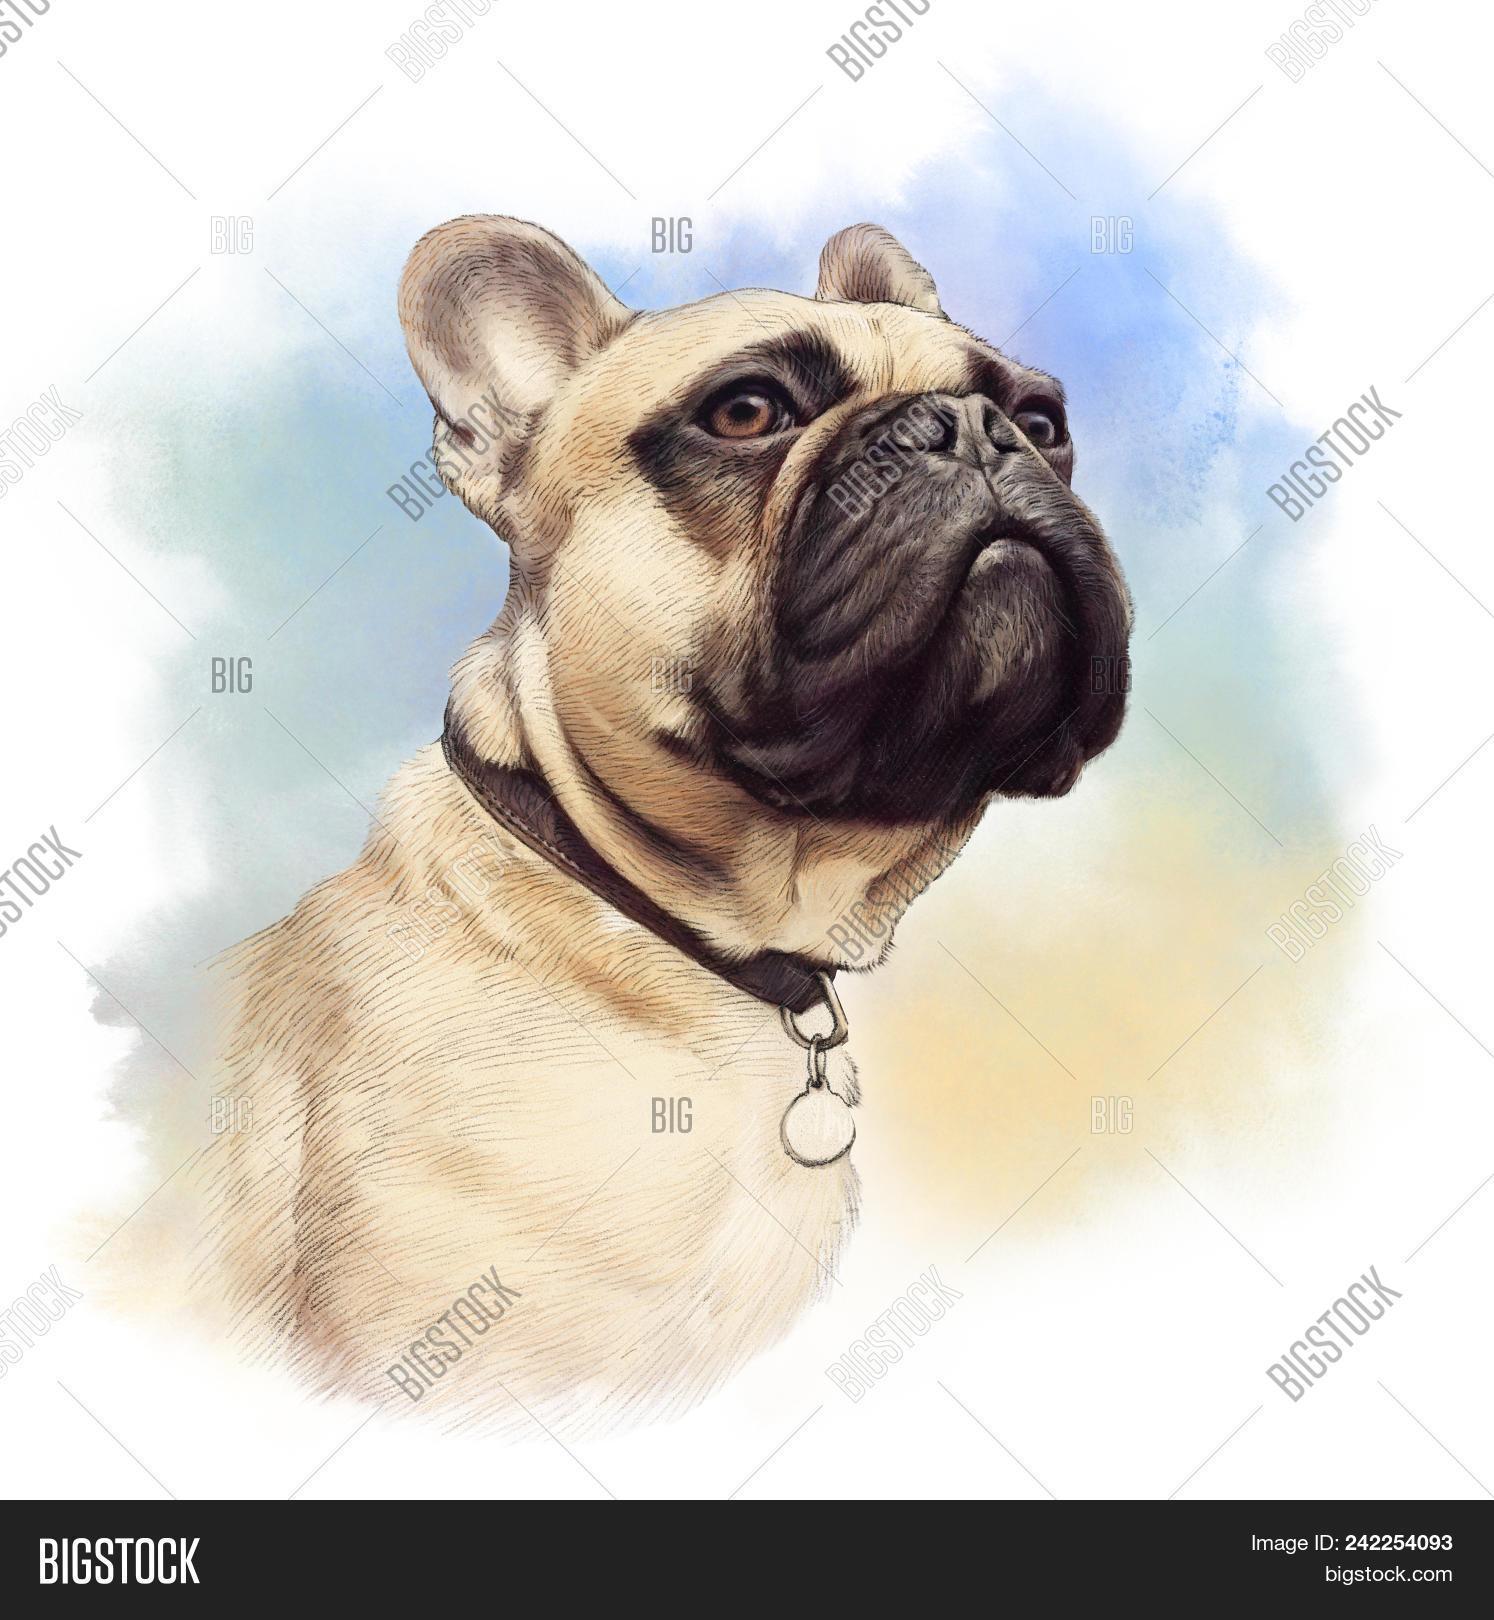 Cute French Bulldog Image Photo Free Trial Bigstock